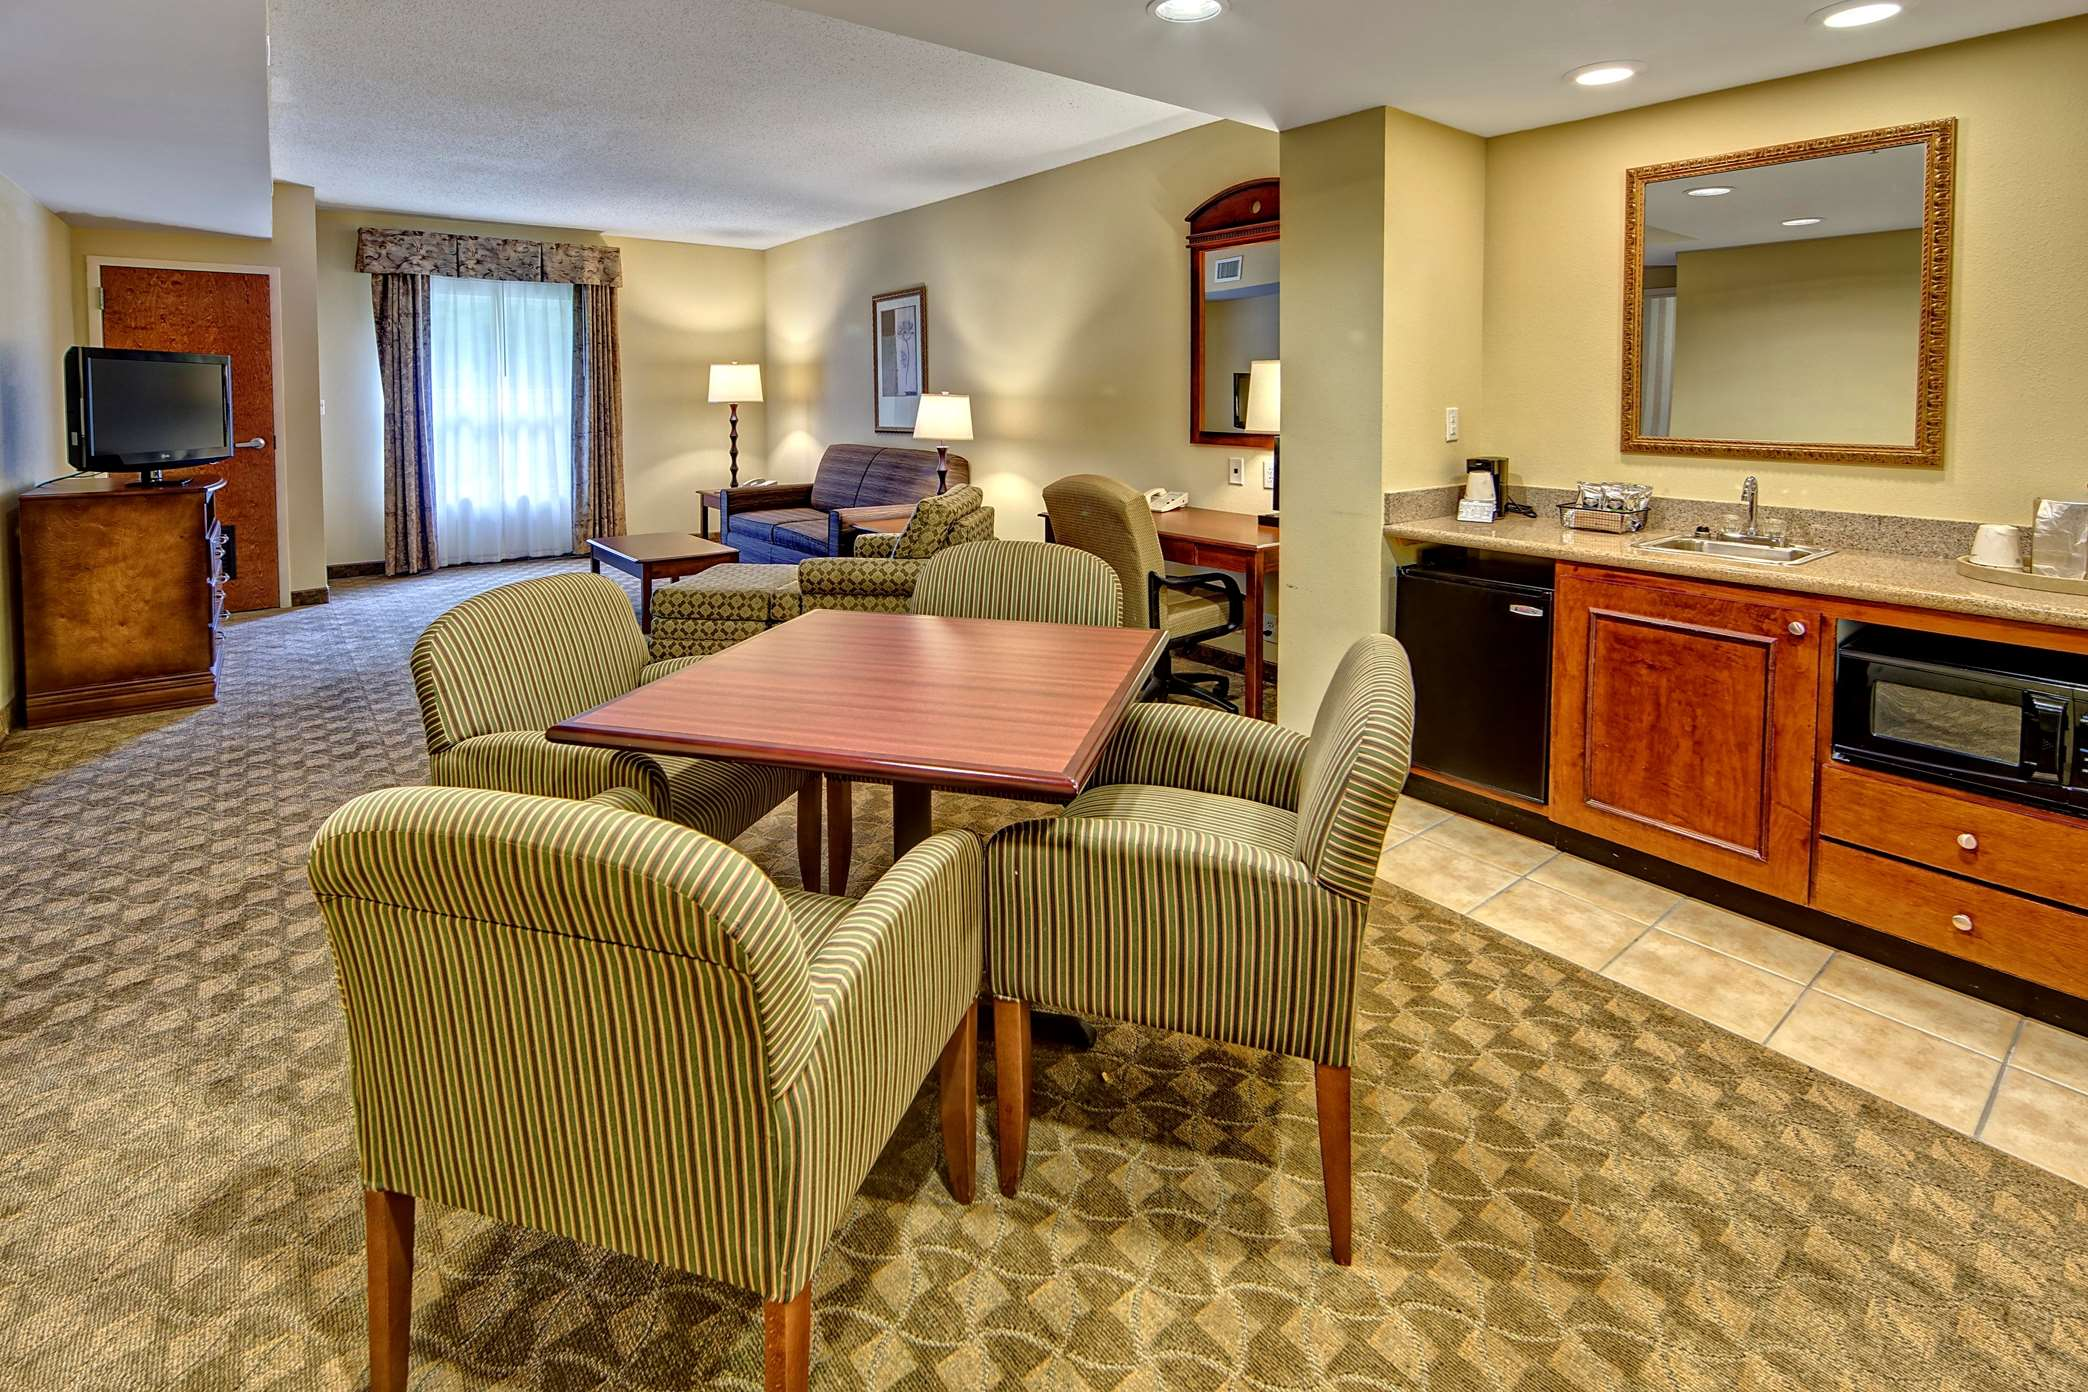 Hampton Inn & Suites Cashiers-Sapphire Valley image 26